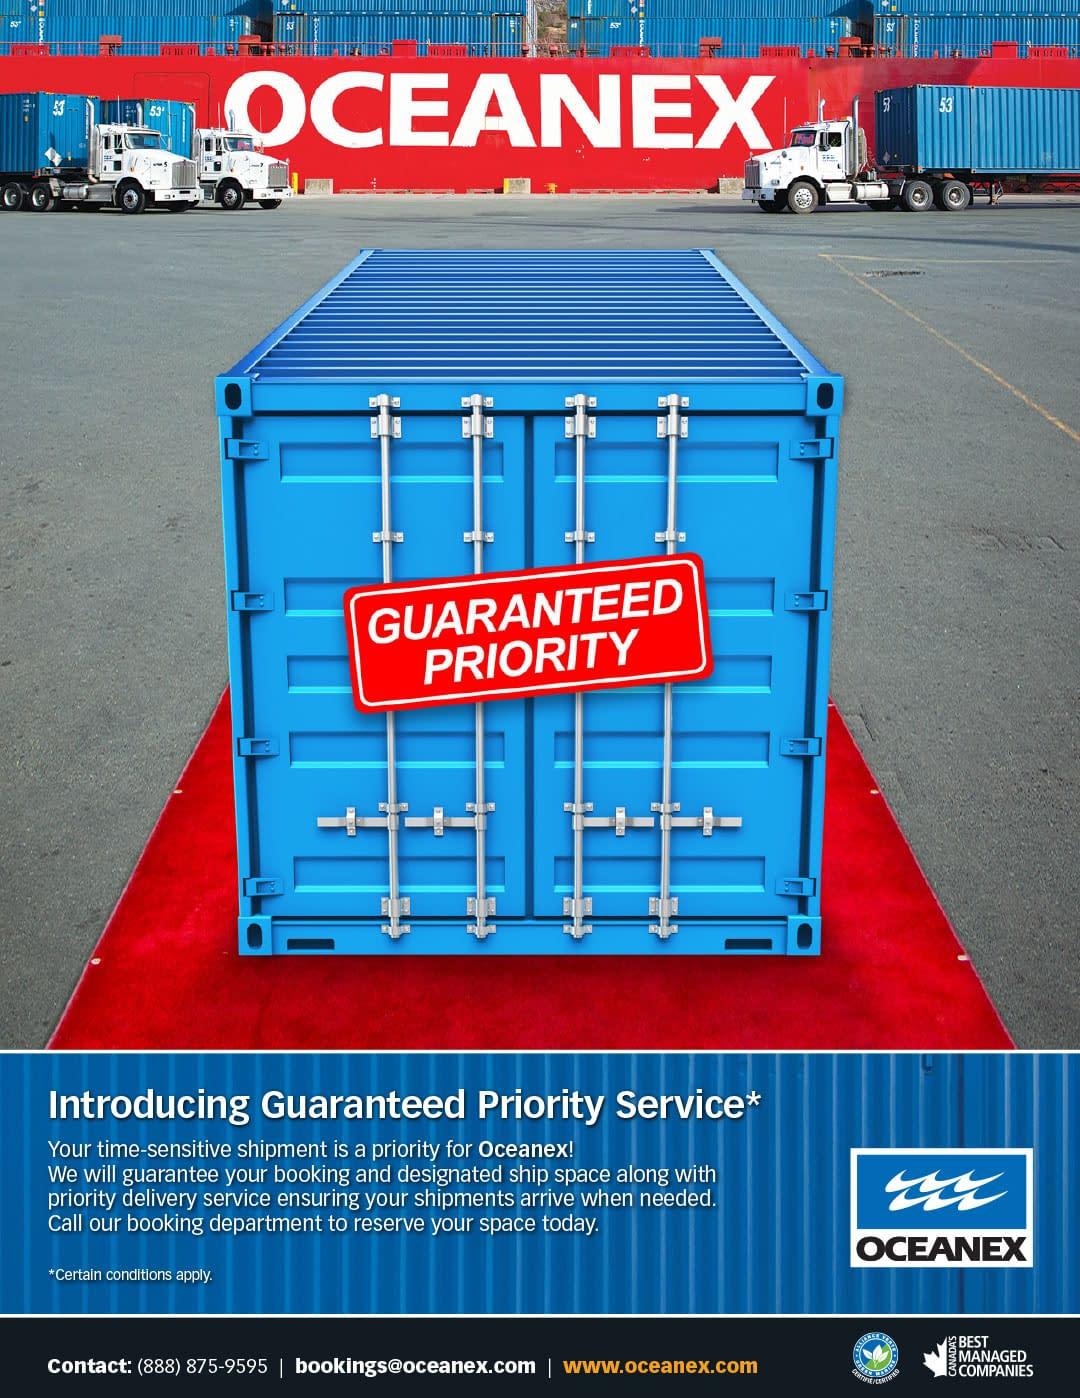 Oceanex-Guaranteed-Priority-ad